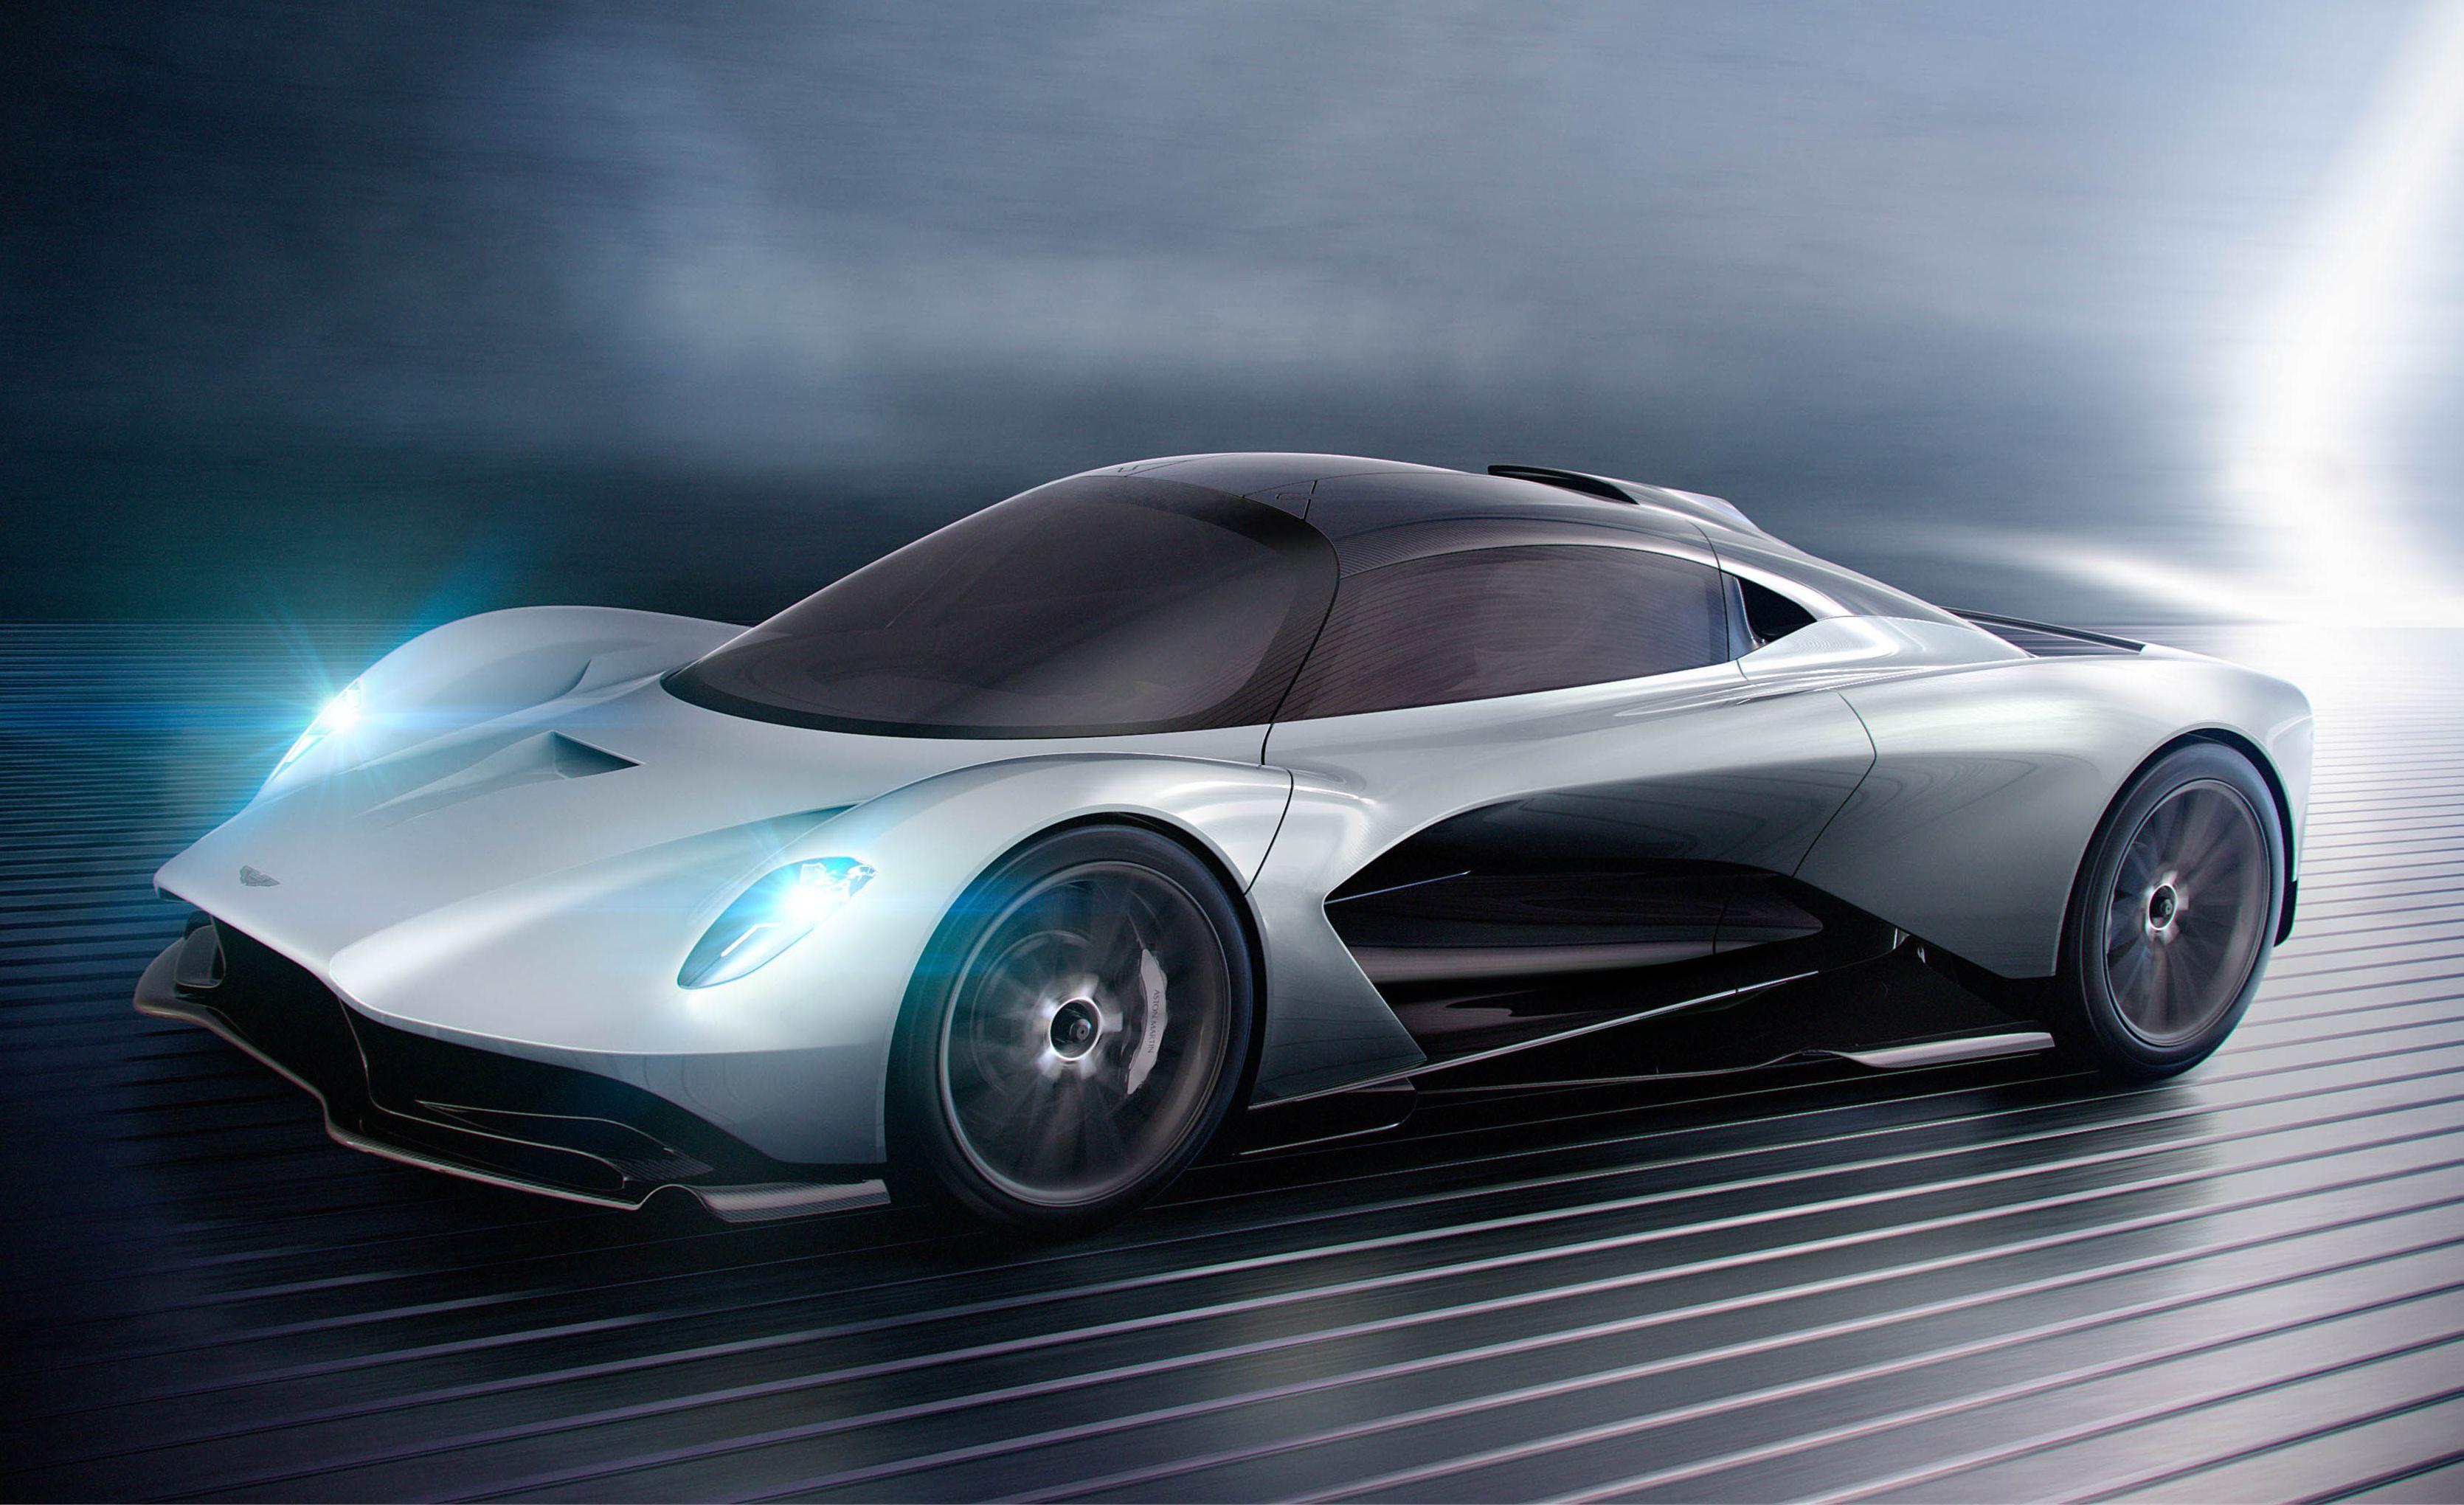 2022 Aston Martin Valhalla What We Know So Far